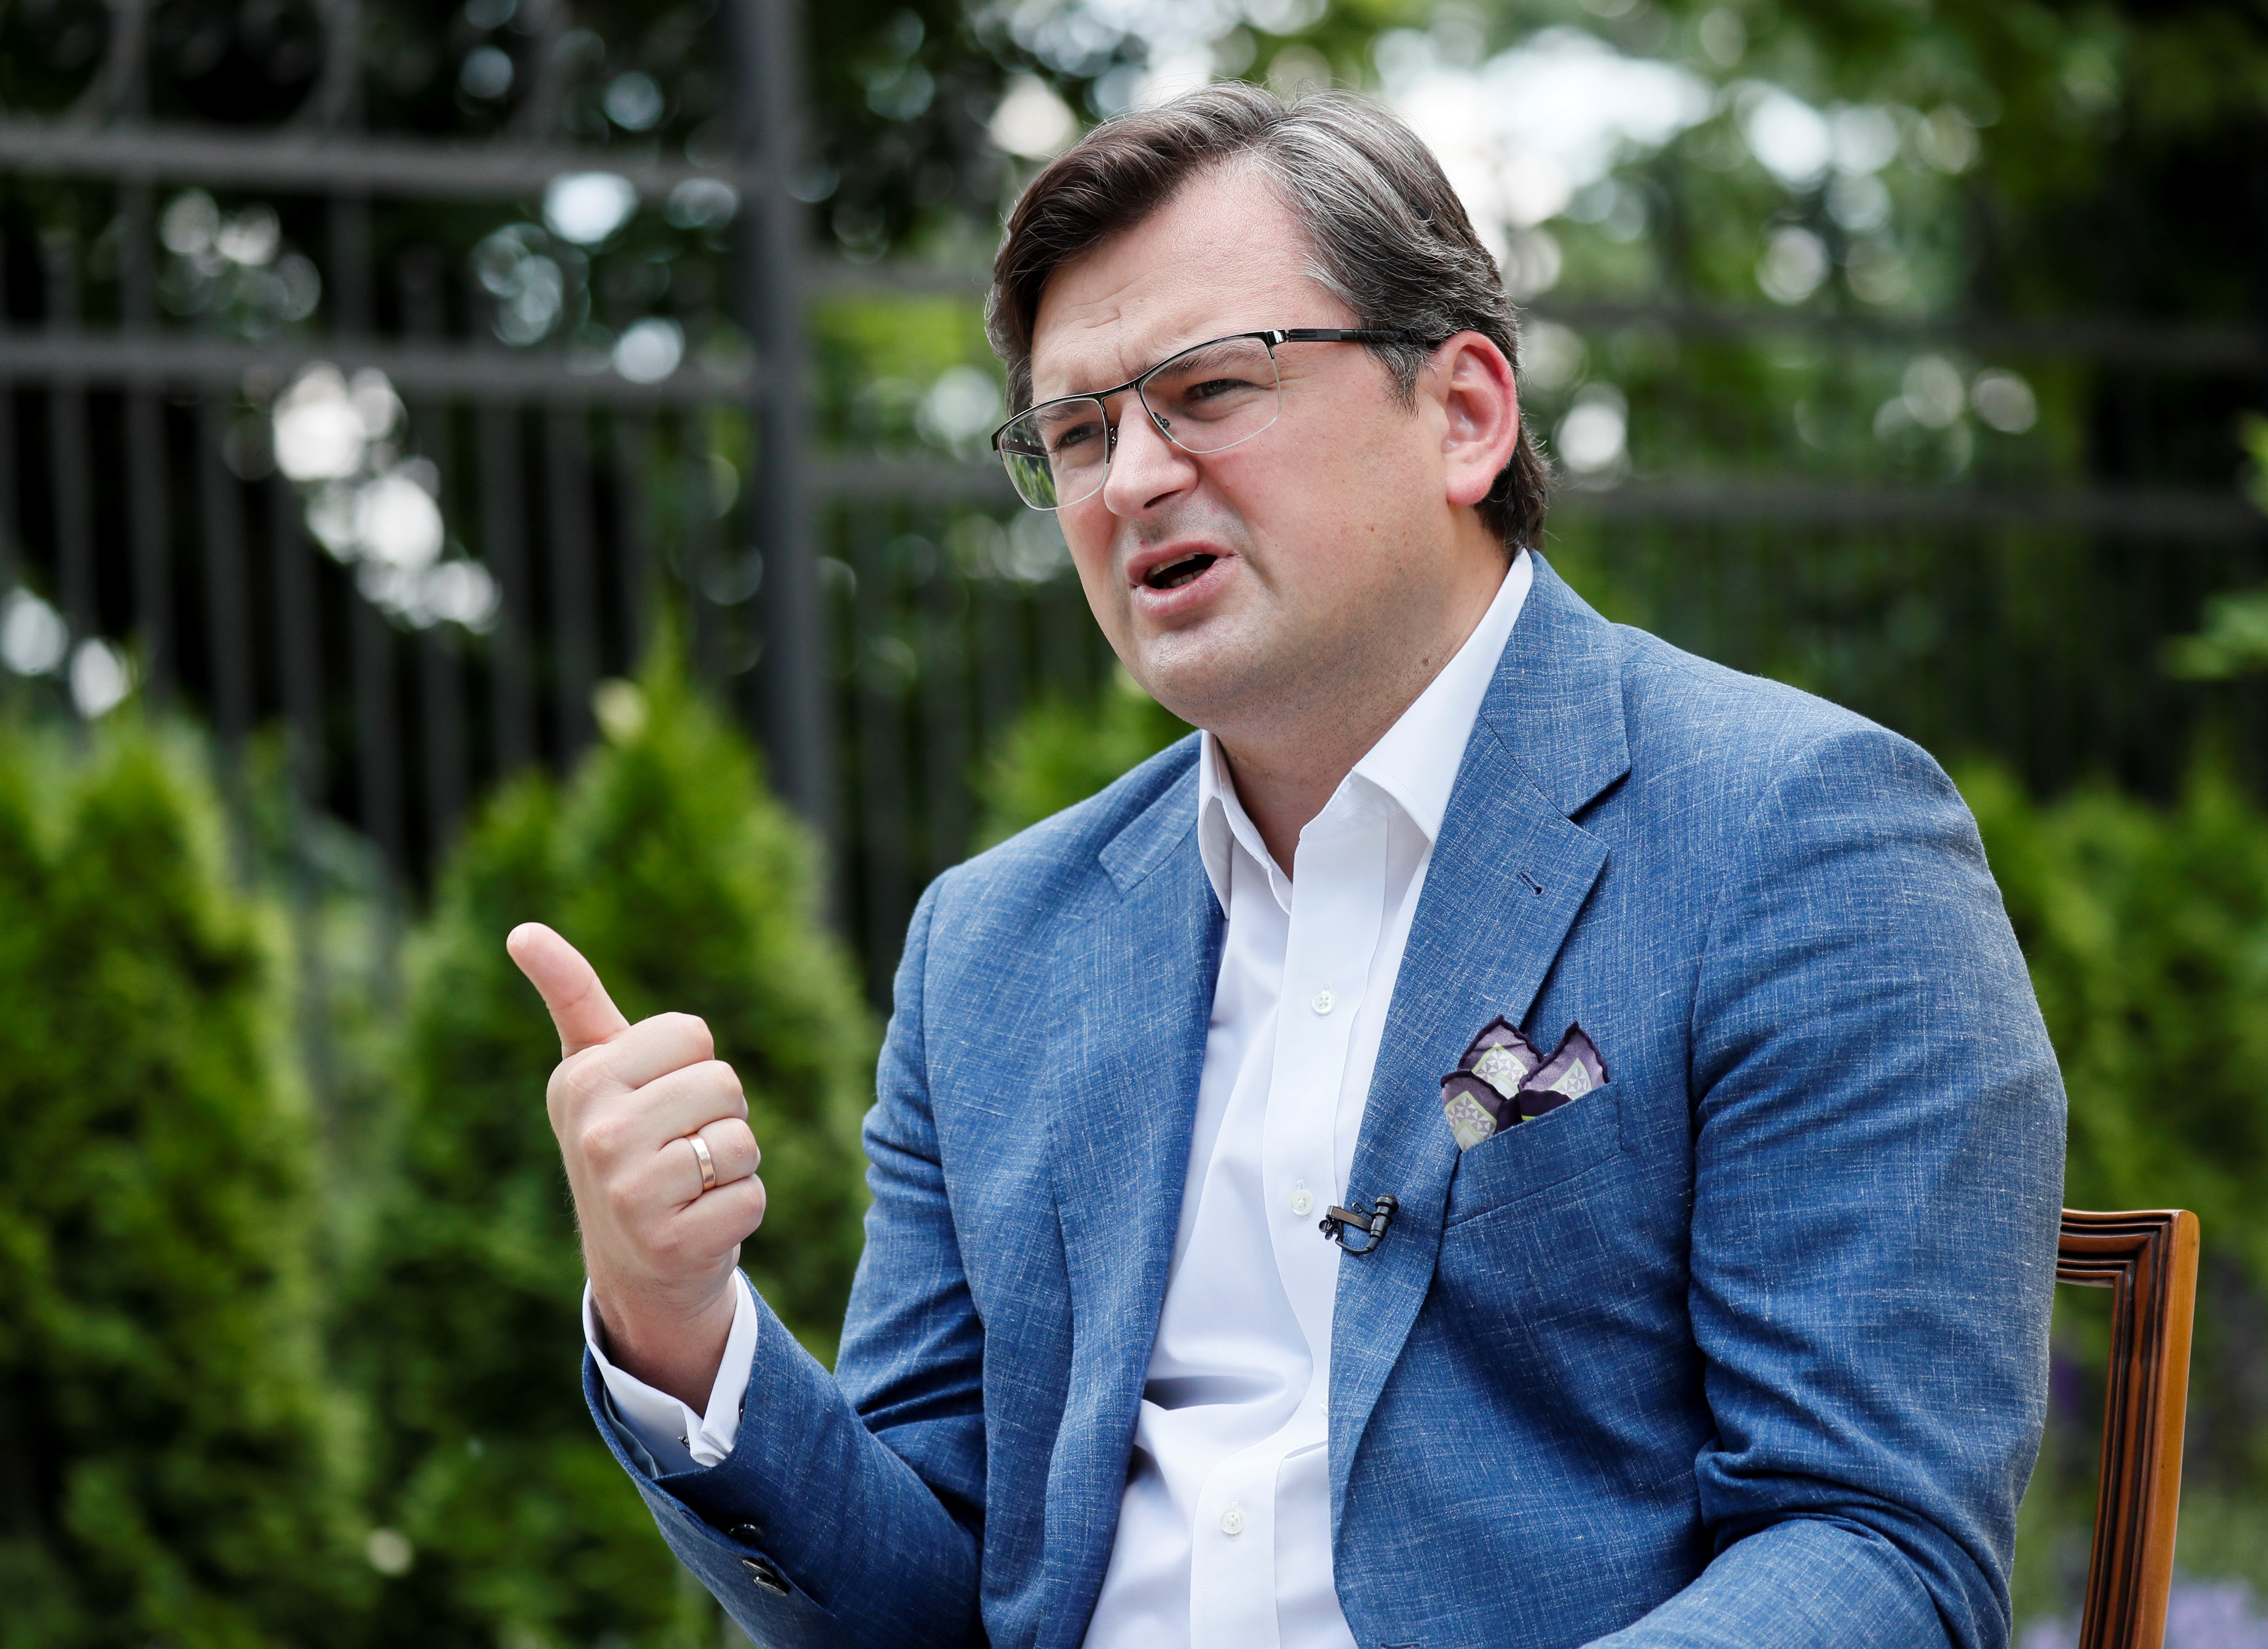 Ukrainian Foreign Minister Dmytro Kuleba speaks during an interview in Kyiv, Ukraine, June 17, 2021. REUTERS/Gleb Garanich